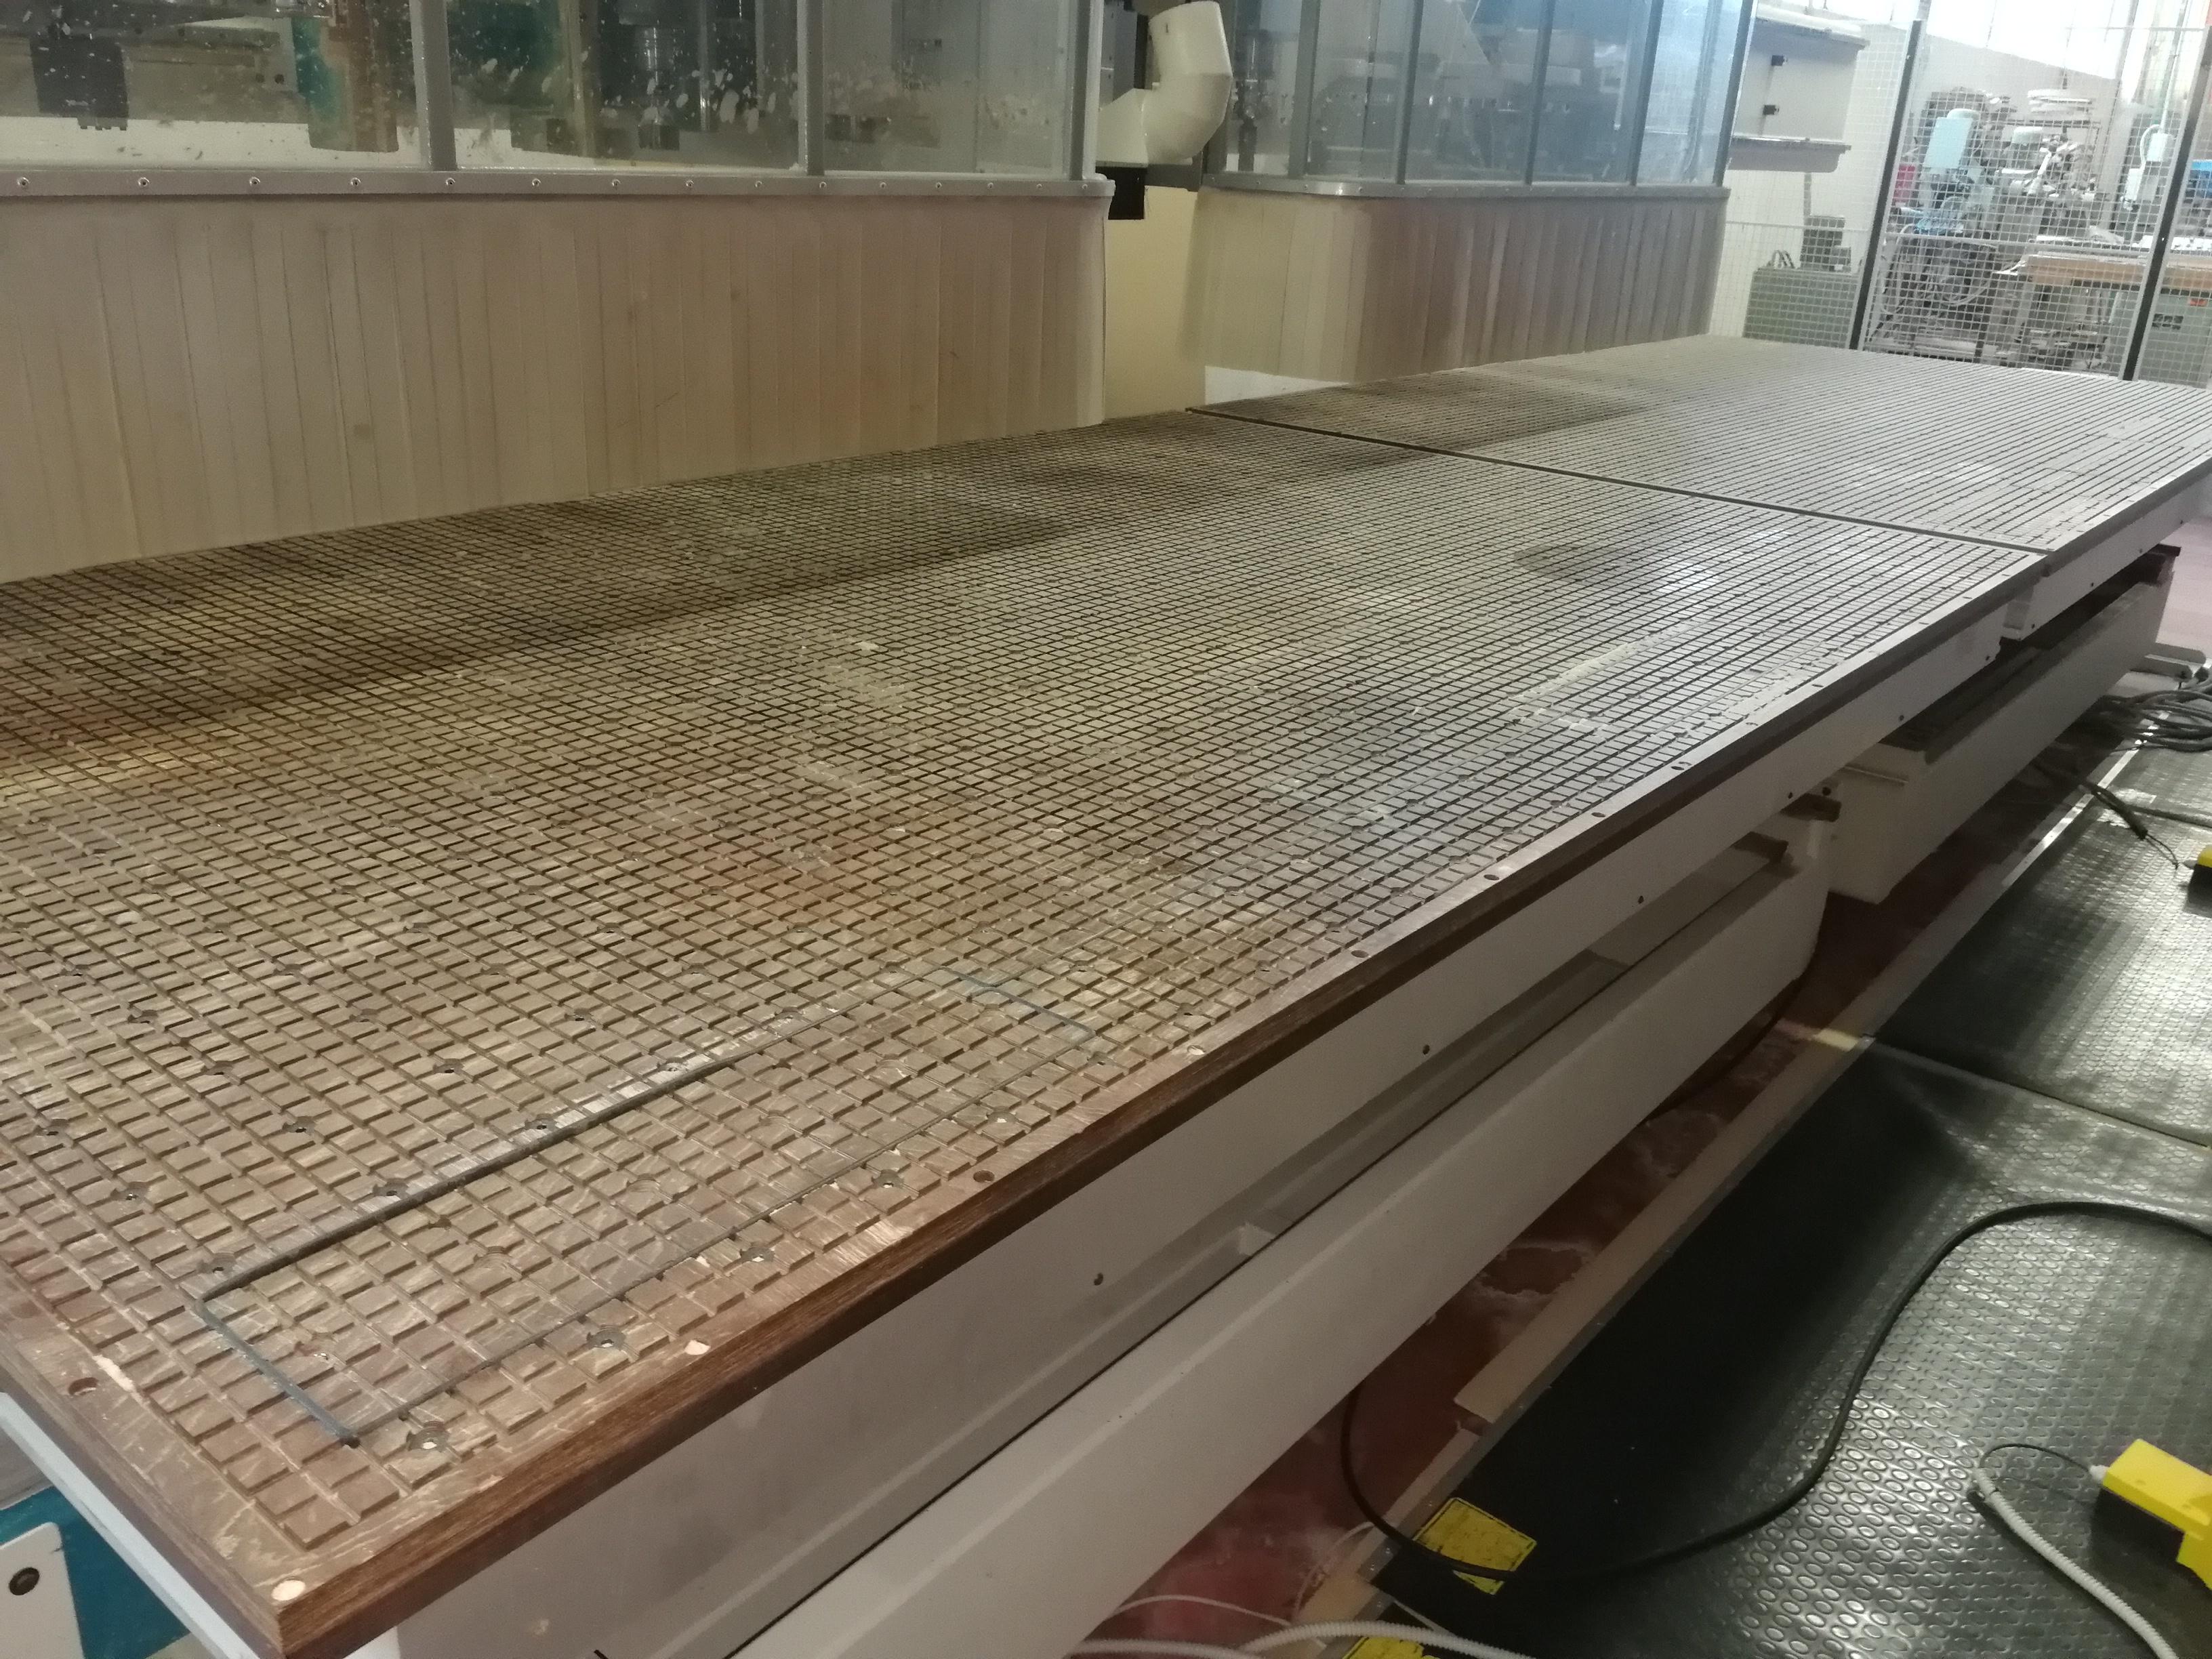 CNC DOPPIA TESTA 5 ASSI - UNITEAM MAJOR 2R/6016-430 in vendita - foto 7